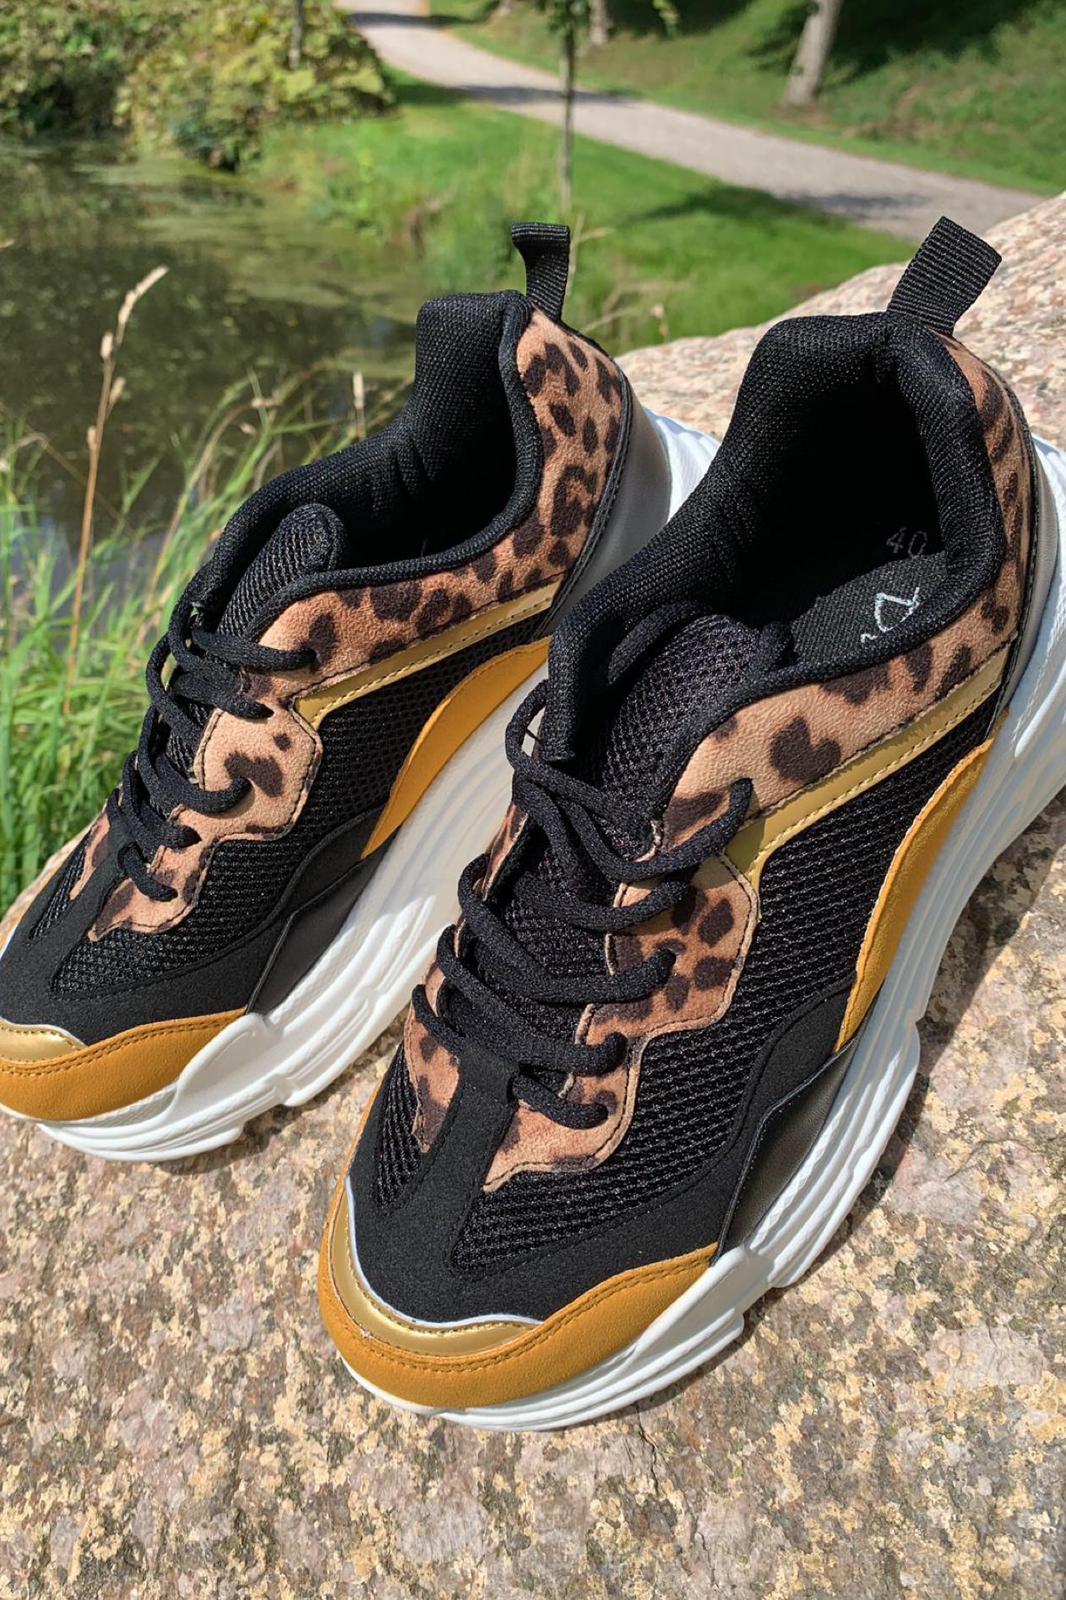 Moves sneakers, BLACK kondisko